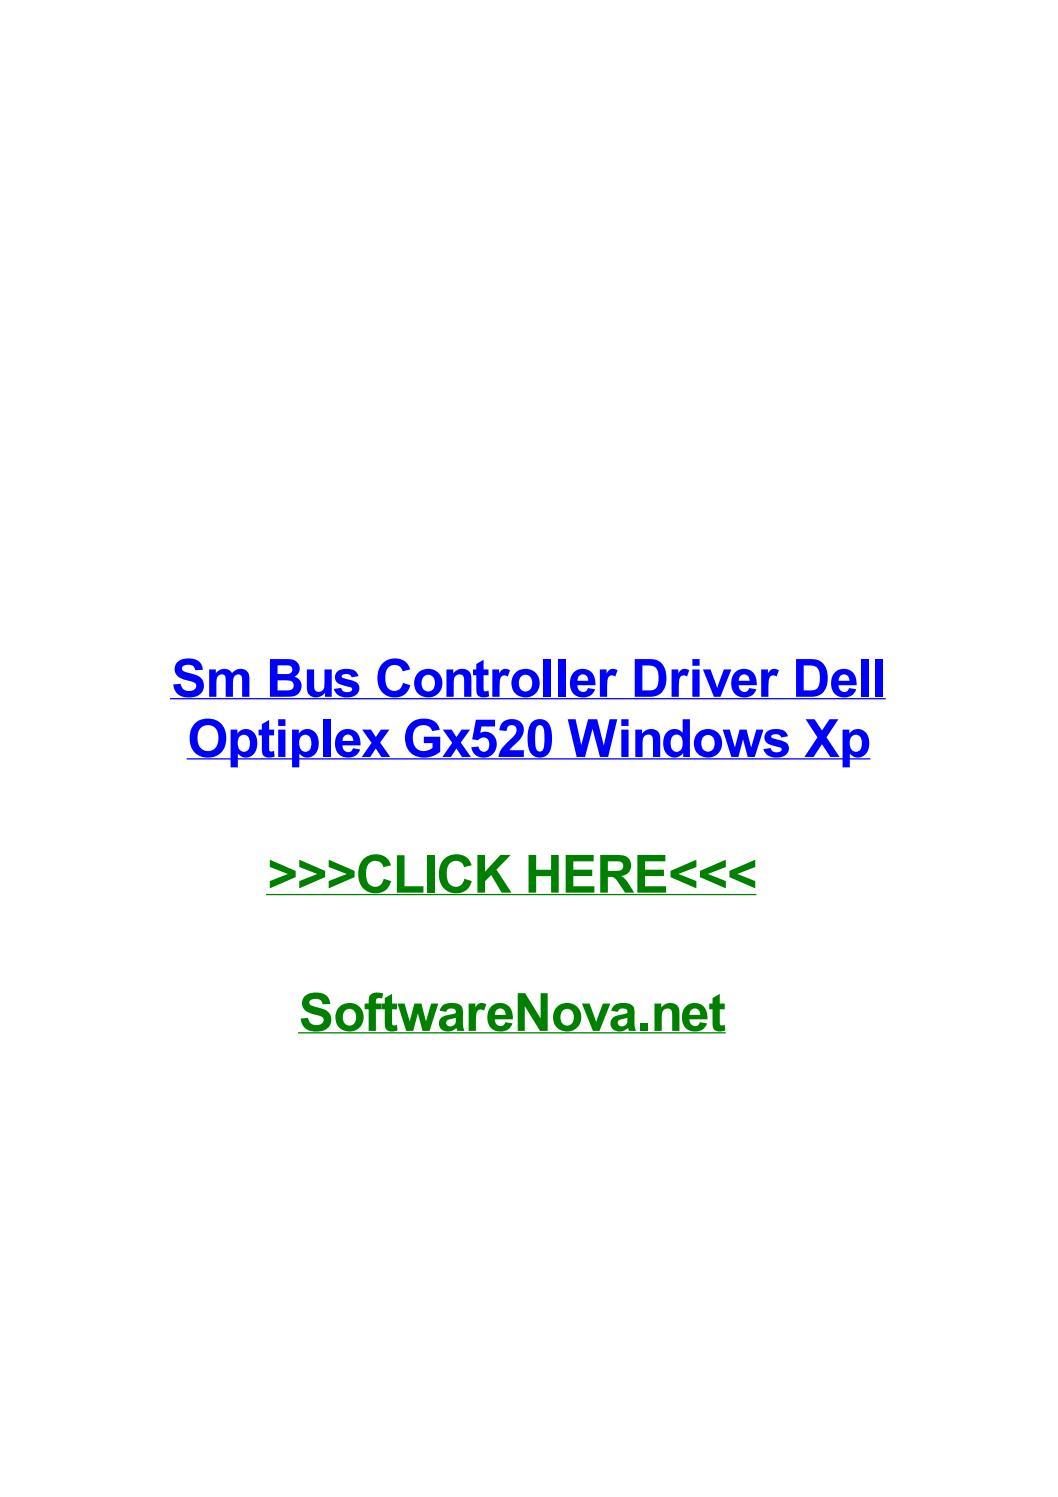 DELL OPTIPLEX GX520 SM BUS CONTROLLER WINDOWS 8 DRIVER